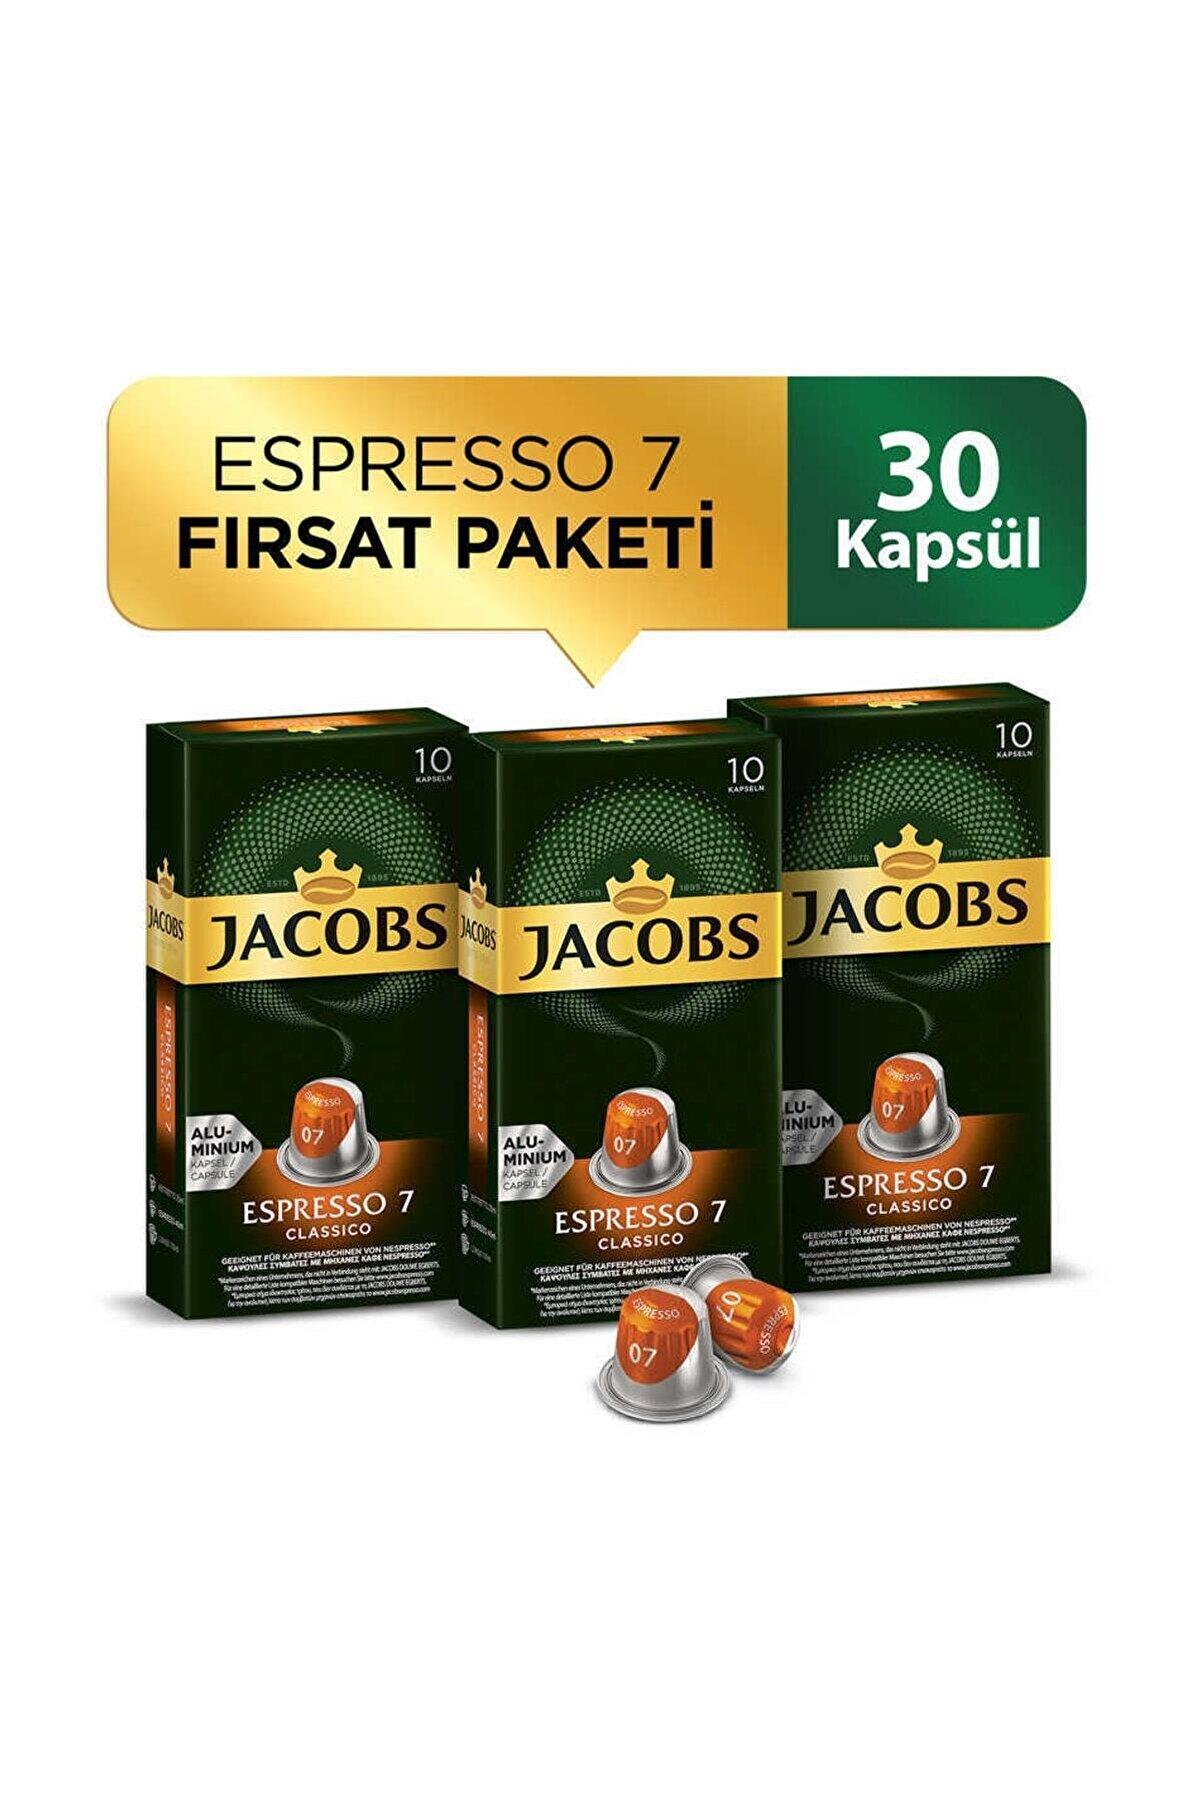 Jacobs Espresso 7 Classico Kapsül Kahve 30 Kapsül